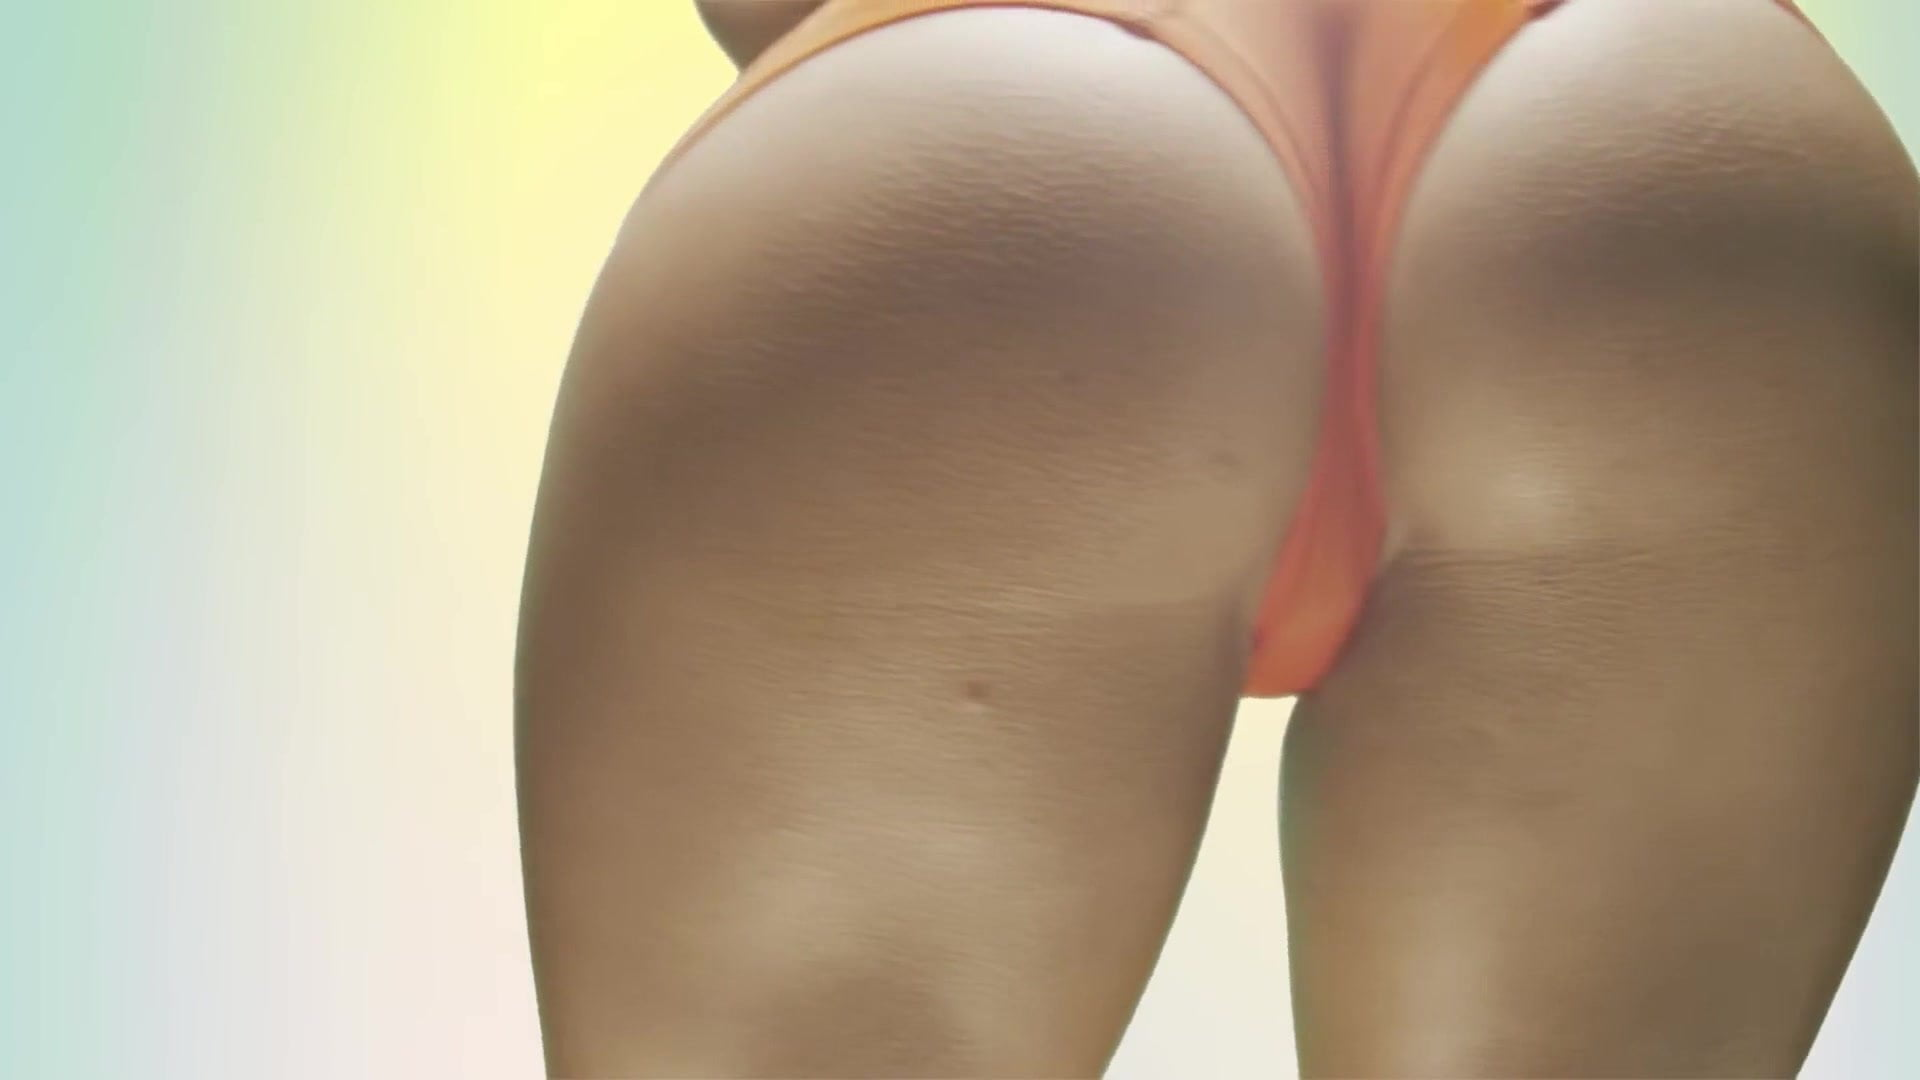 Sexy Twerk Dance Free Teen Hd Porn Video 0D - Xhamster-2836